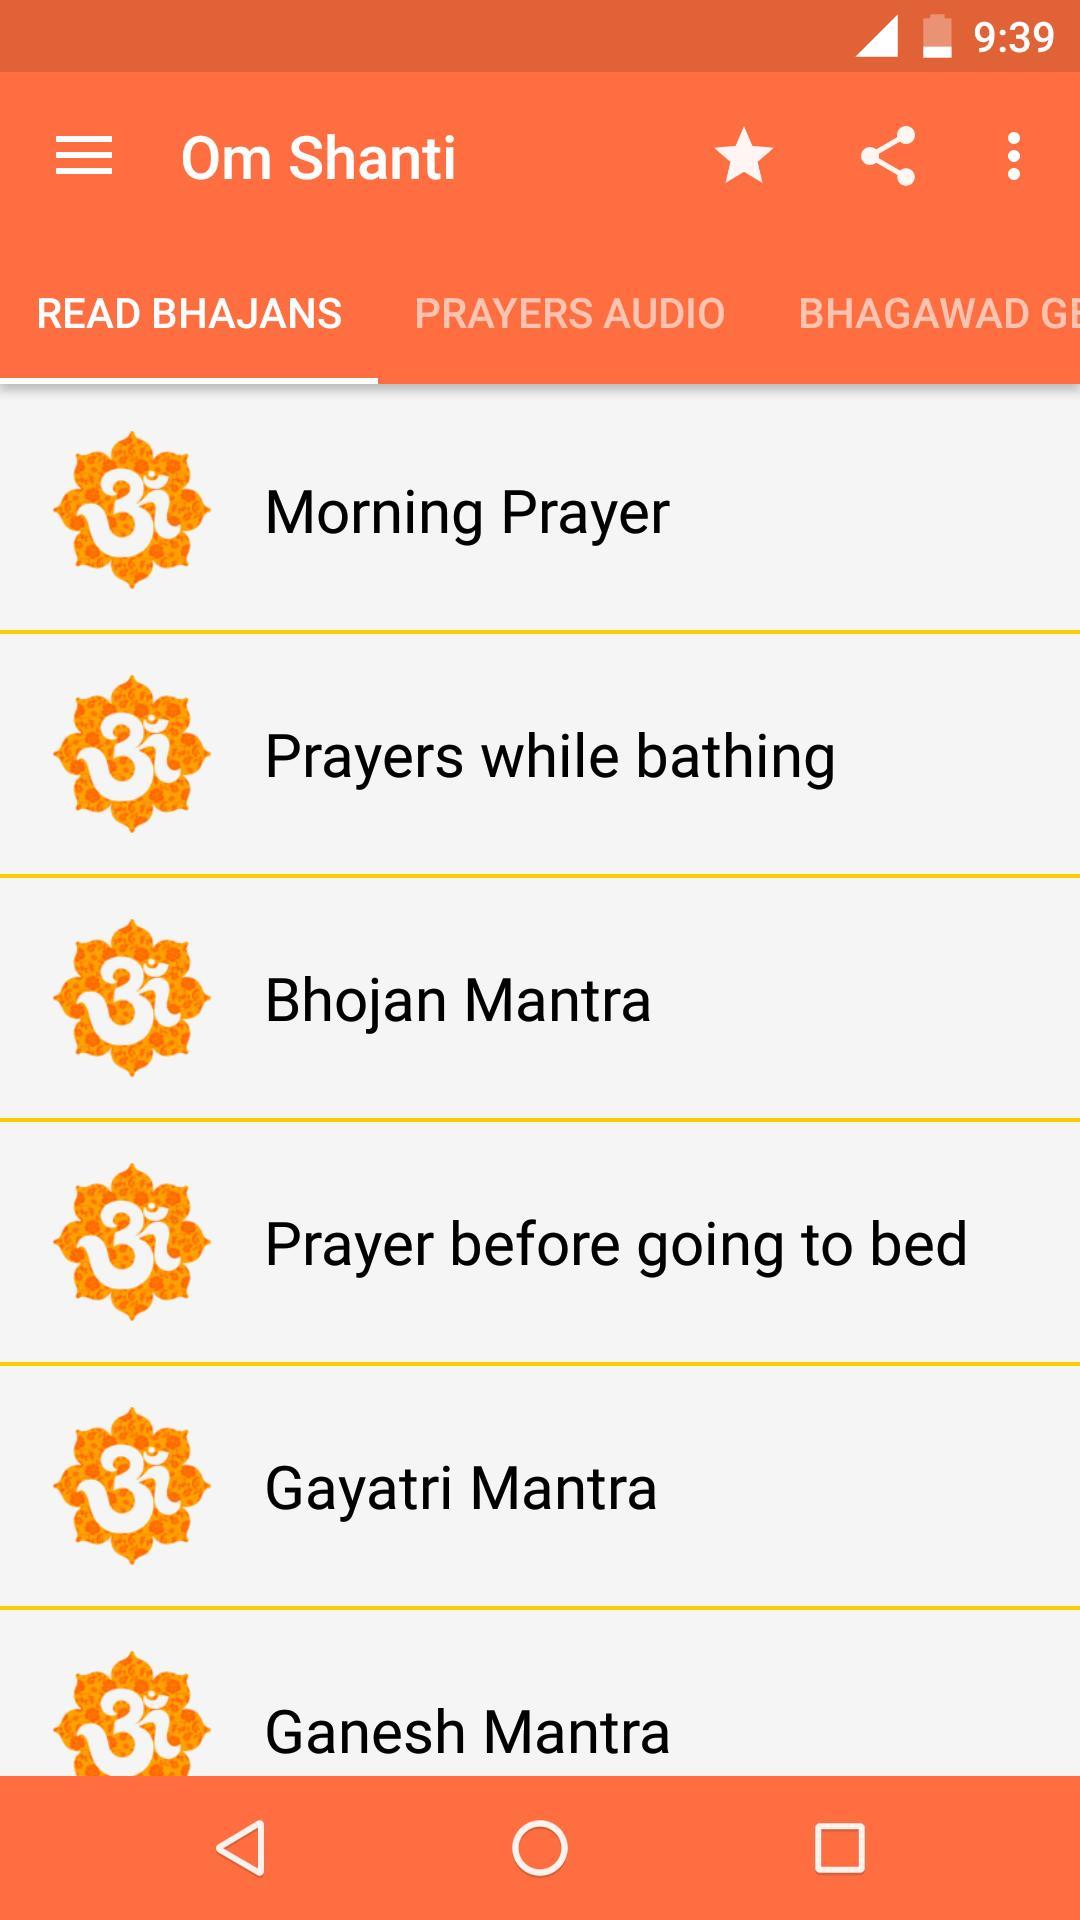 Om Shanti - Hindu Prayer App for Android - APK Download